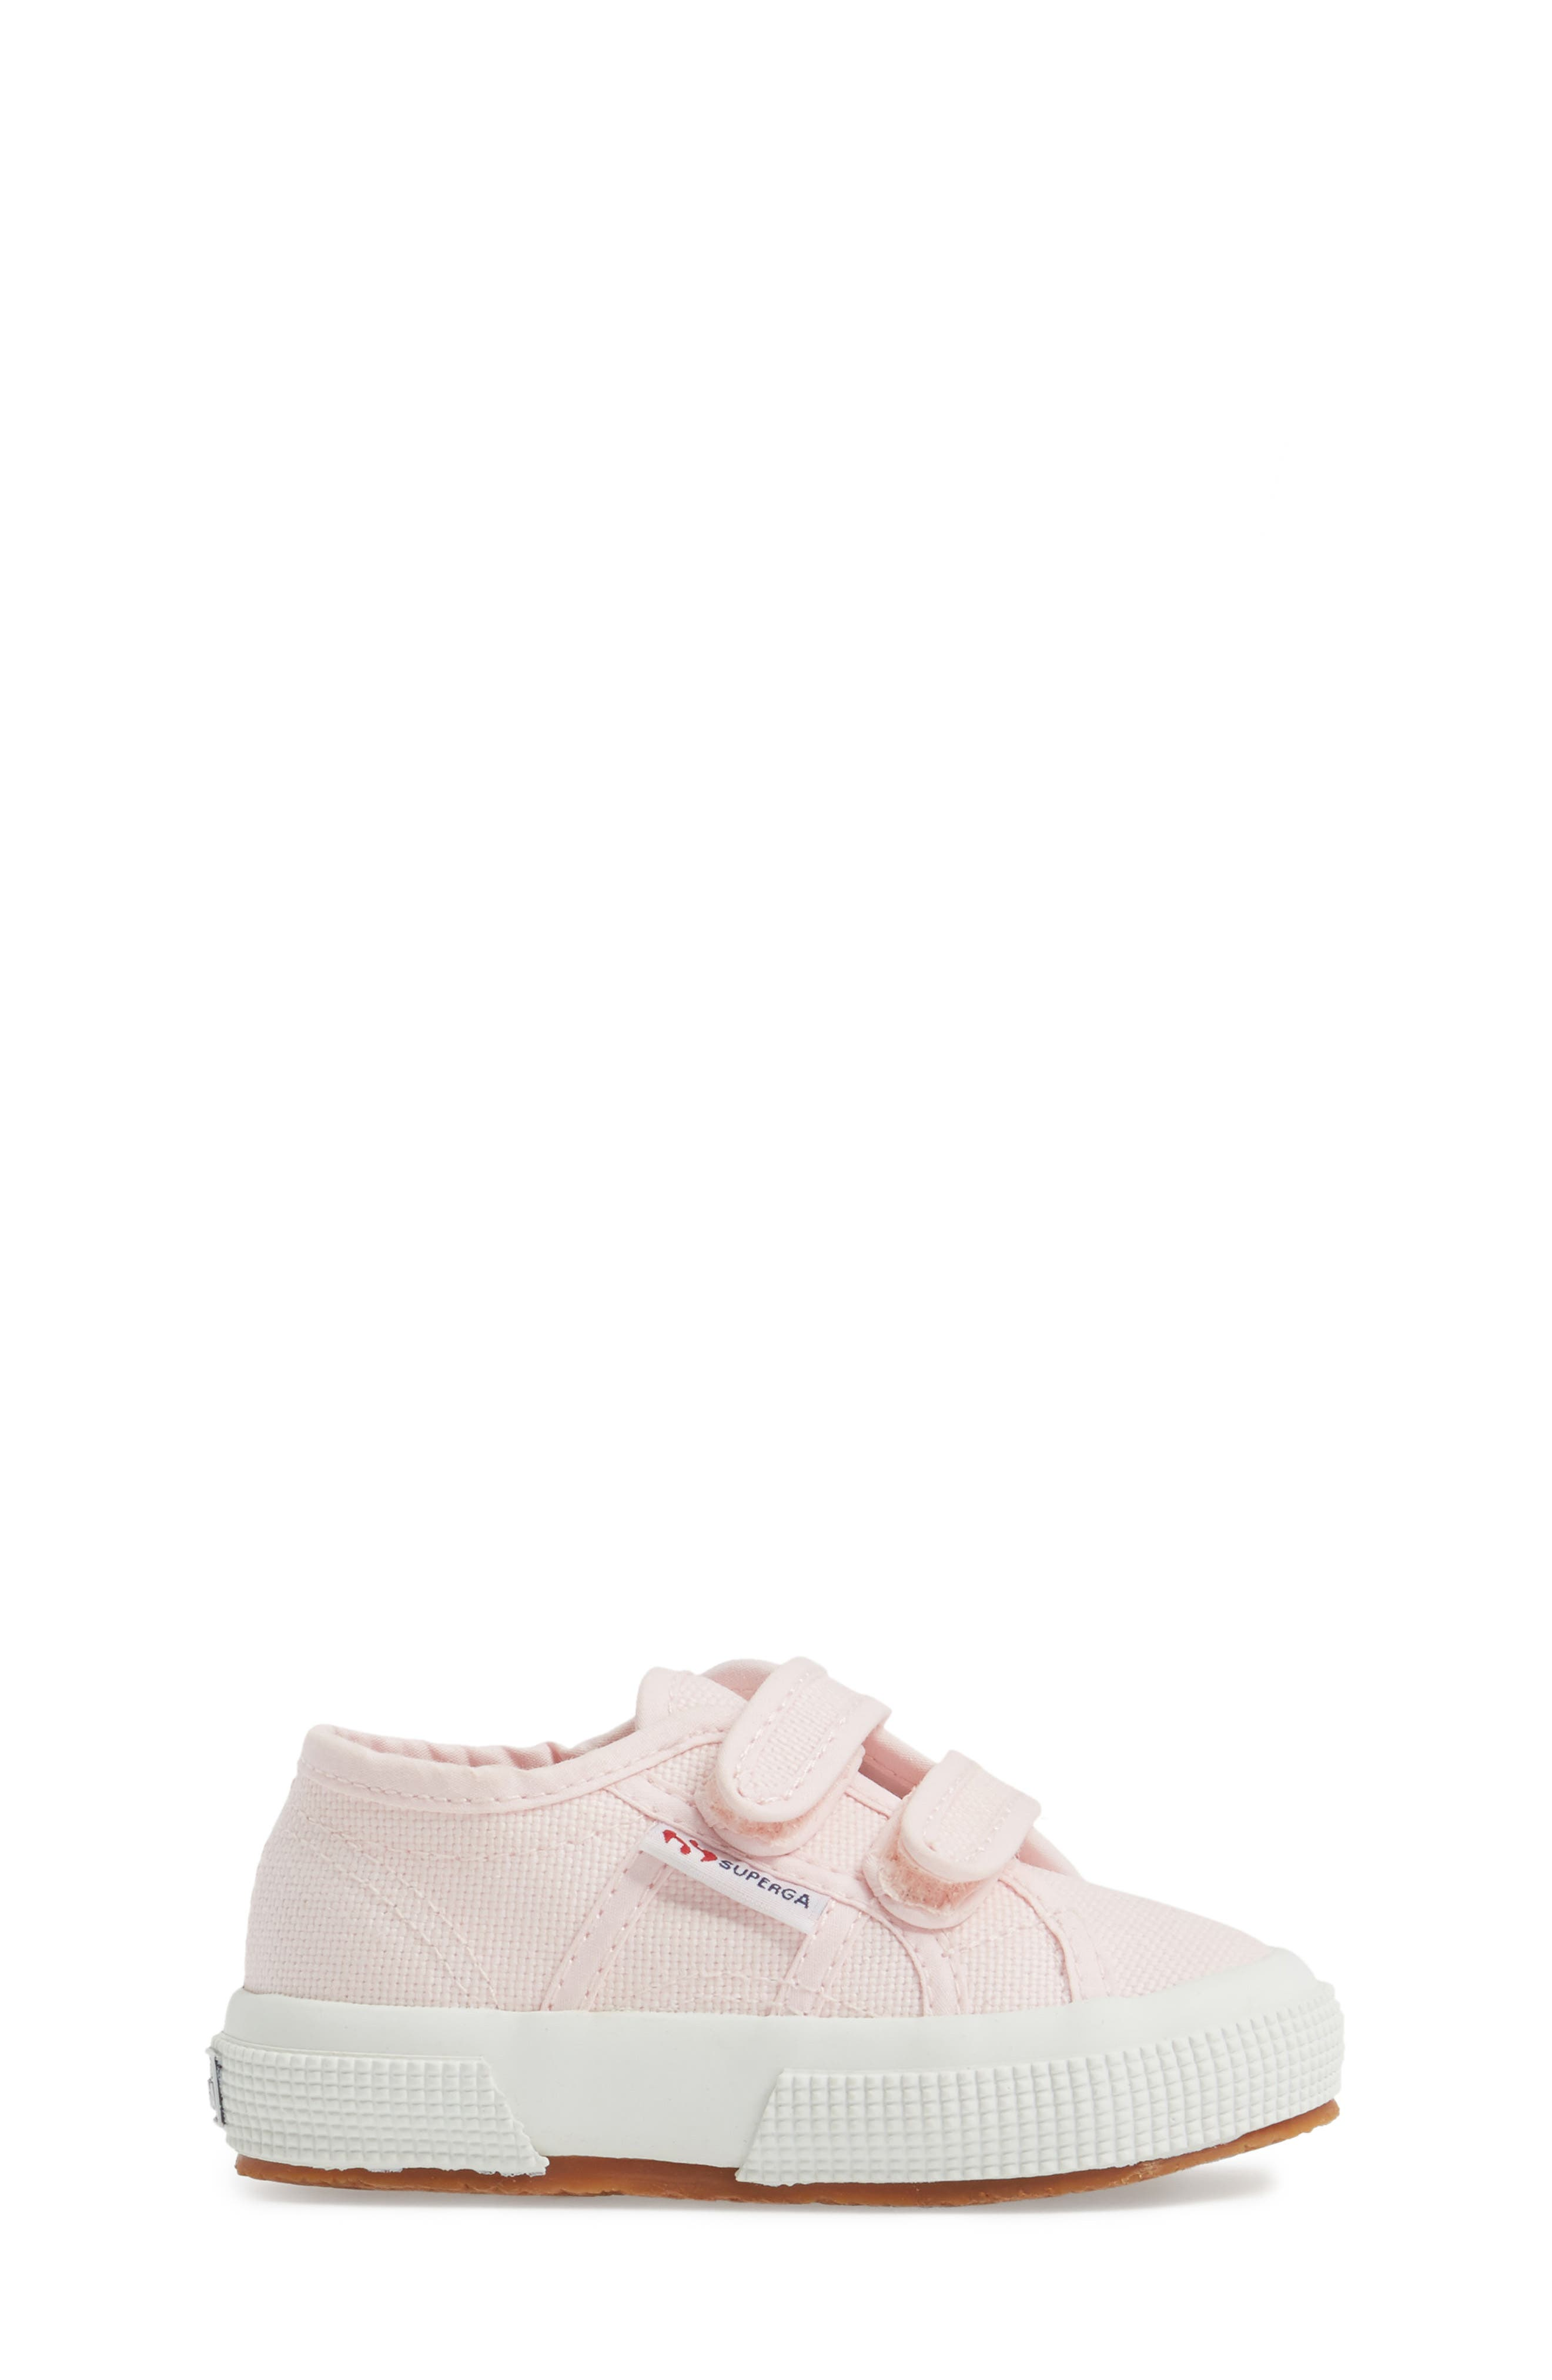 Alternate Image 3  - Superga 'Junior Classic' Sneaker (Toddler & Little Kid)